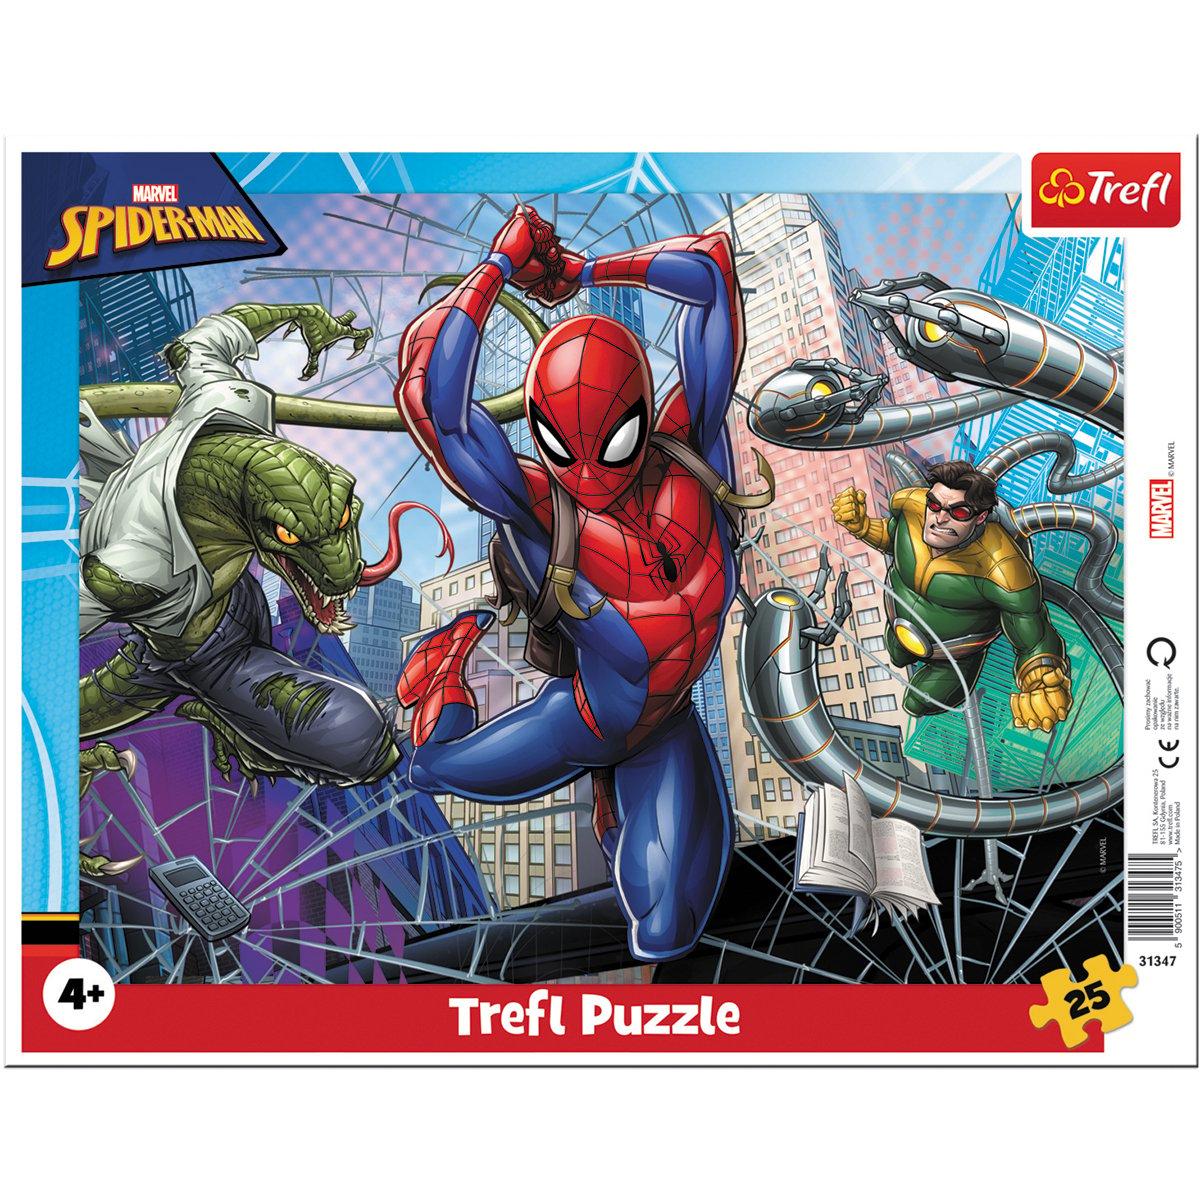 Puzzle Trefl 25 piese in rama, Curajosul Spiderman